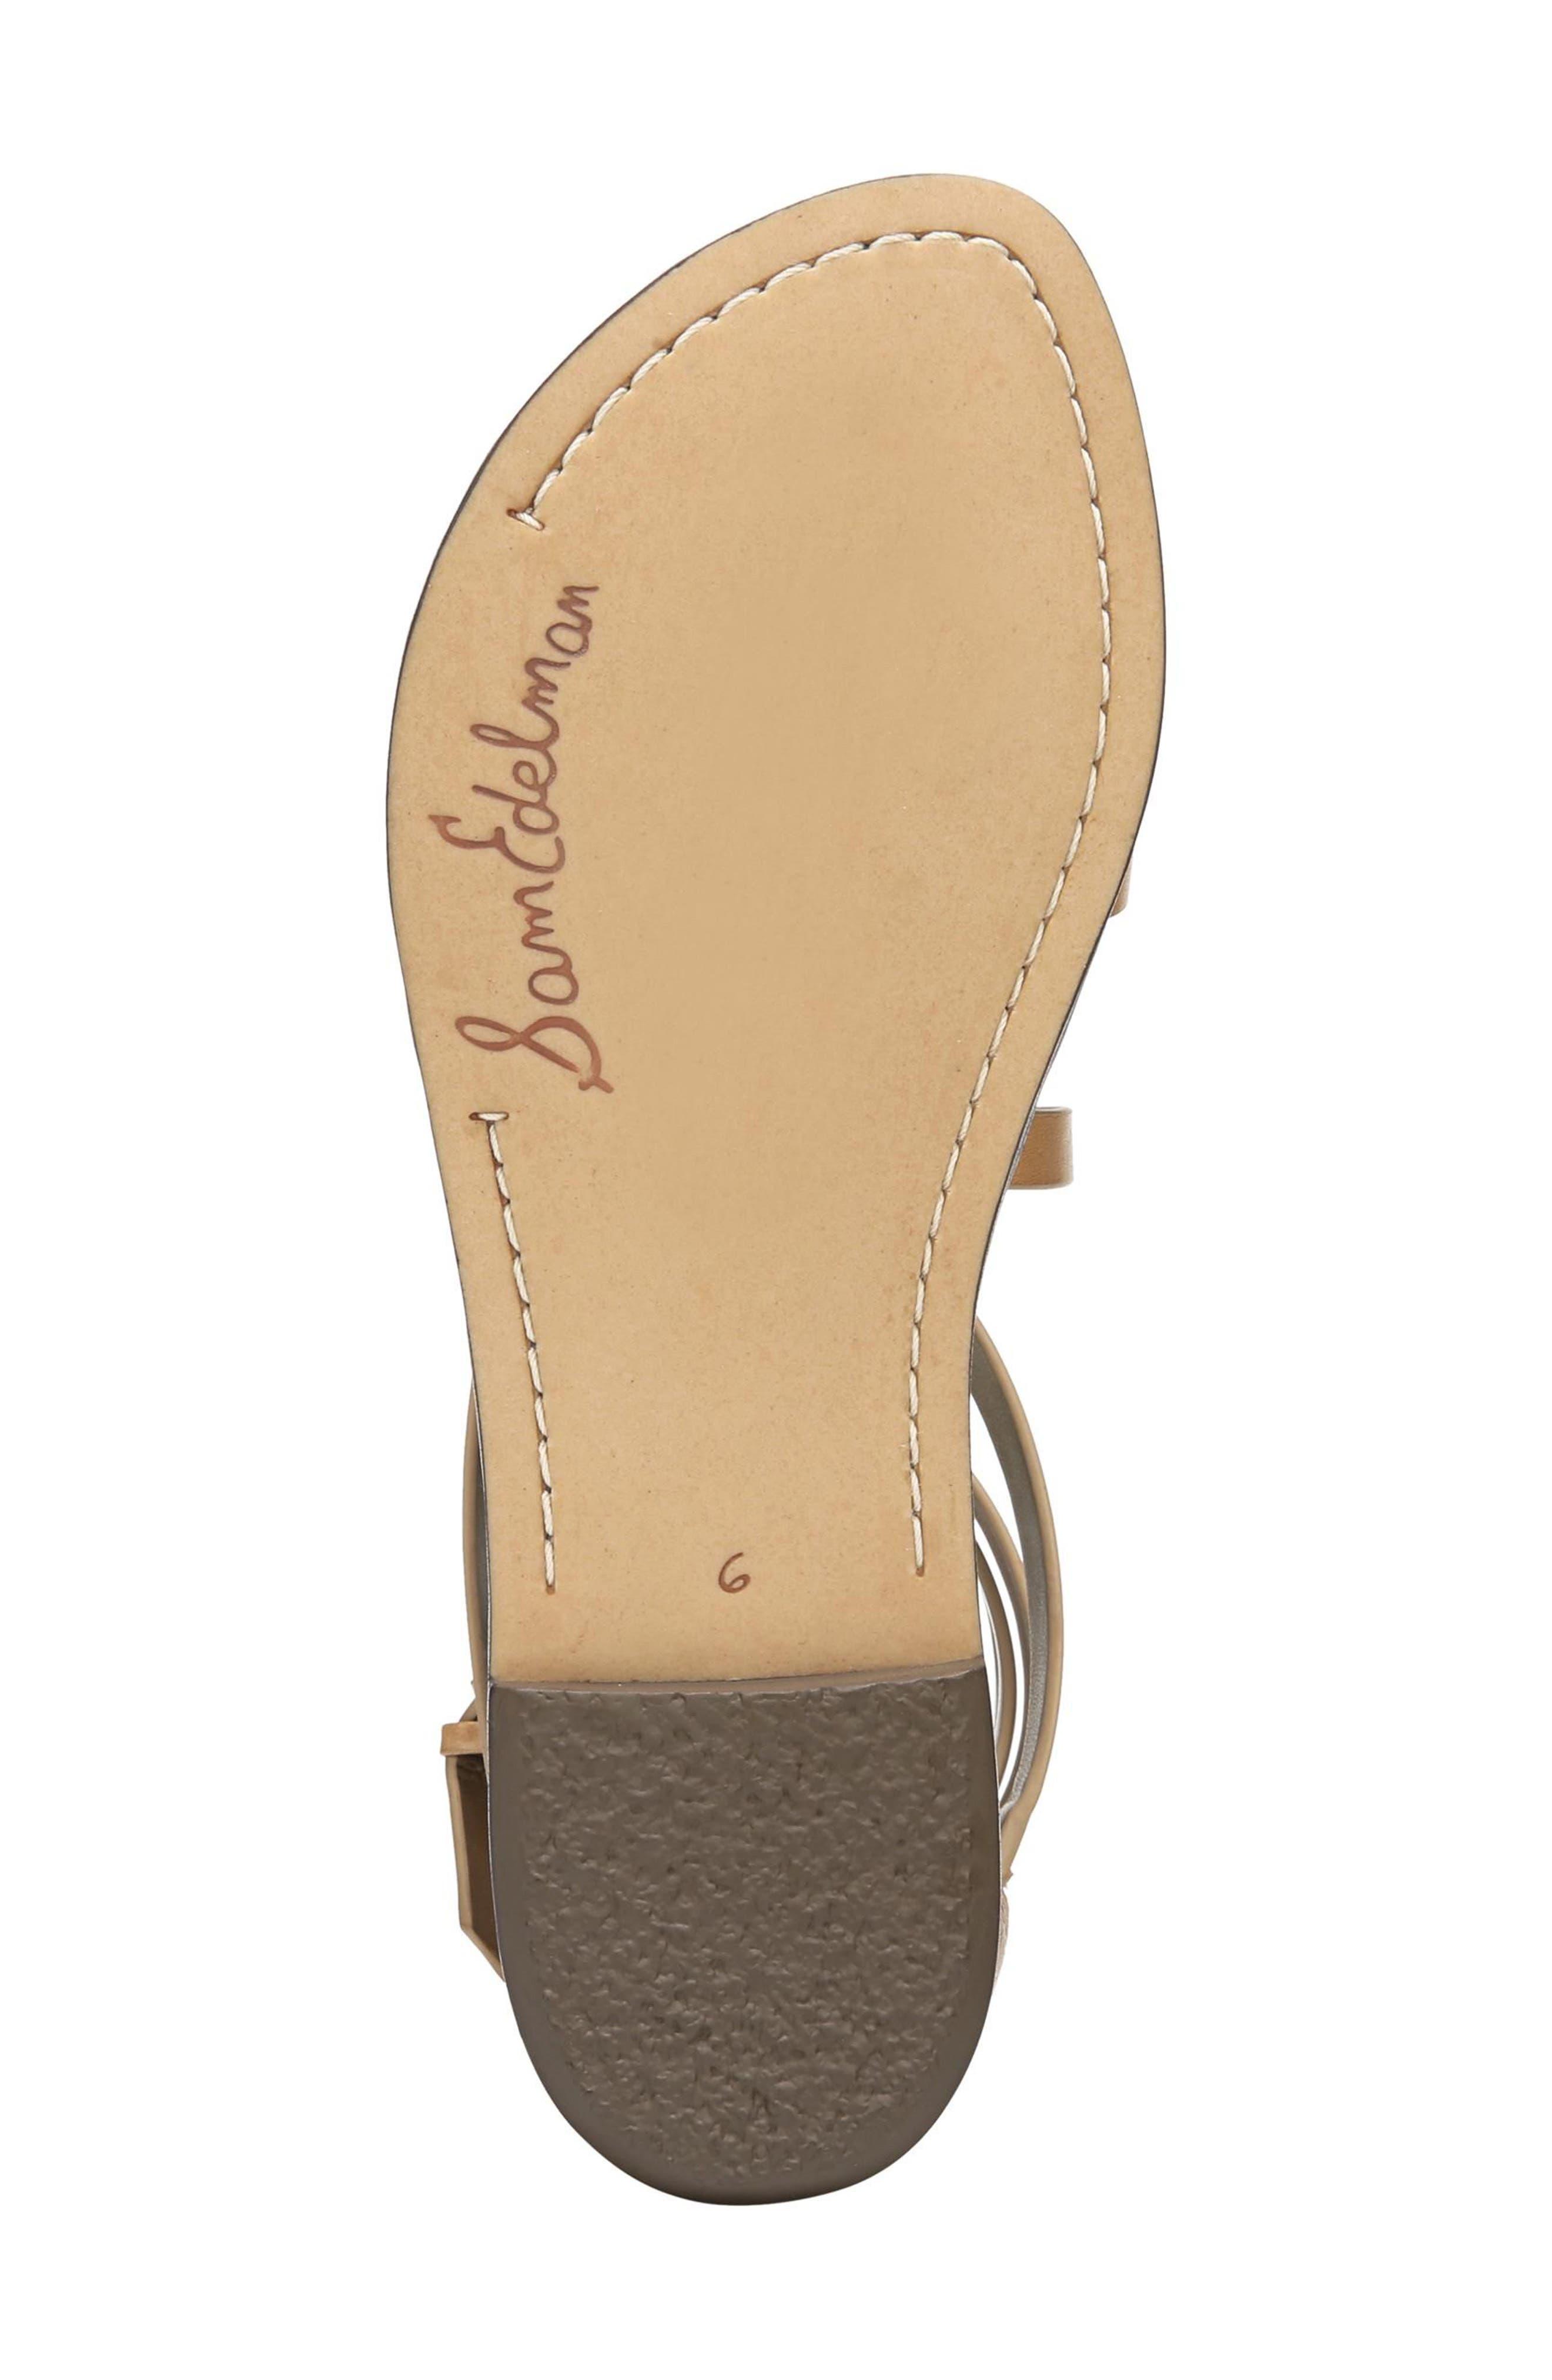 Ganesa Strappy Sandal,                             Alternate thumbnail 6, color,                             Golden Caramel Leather